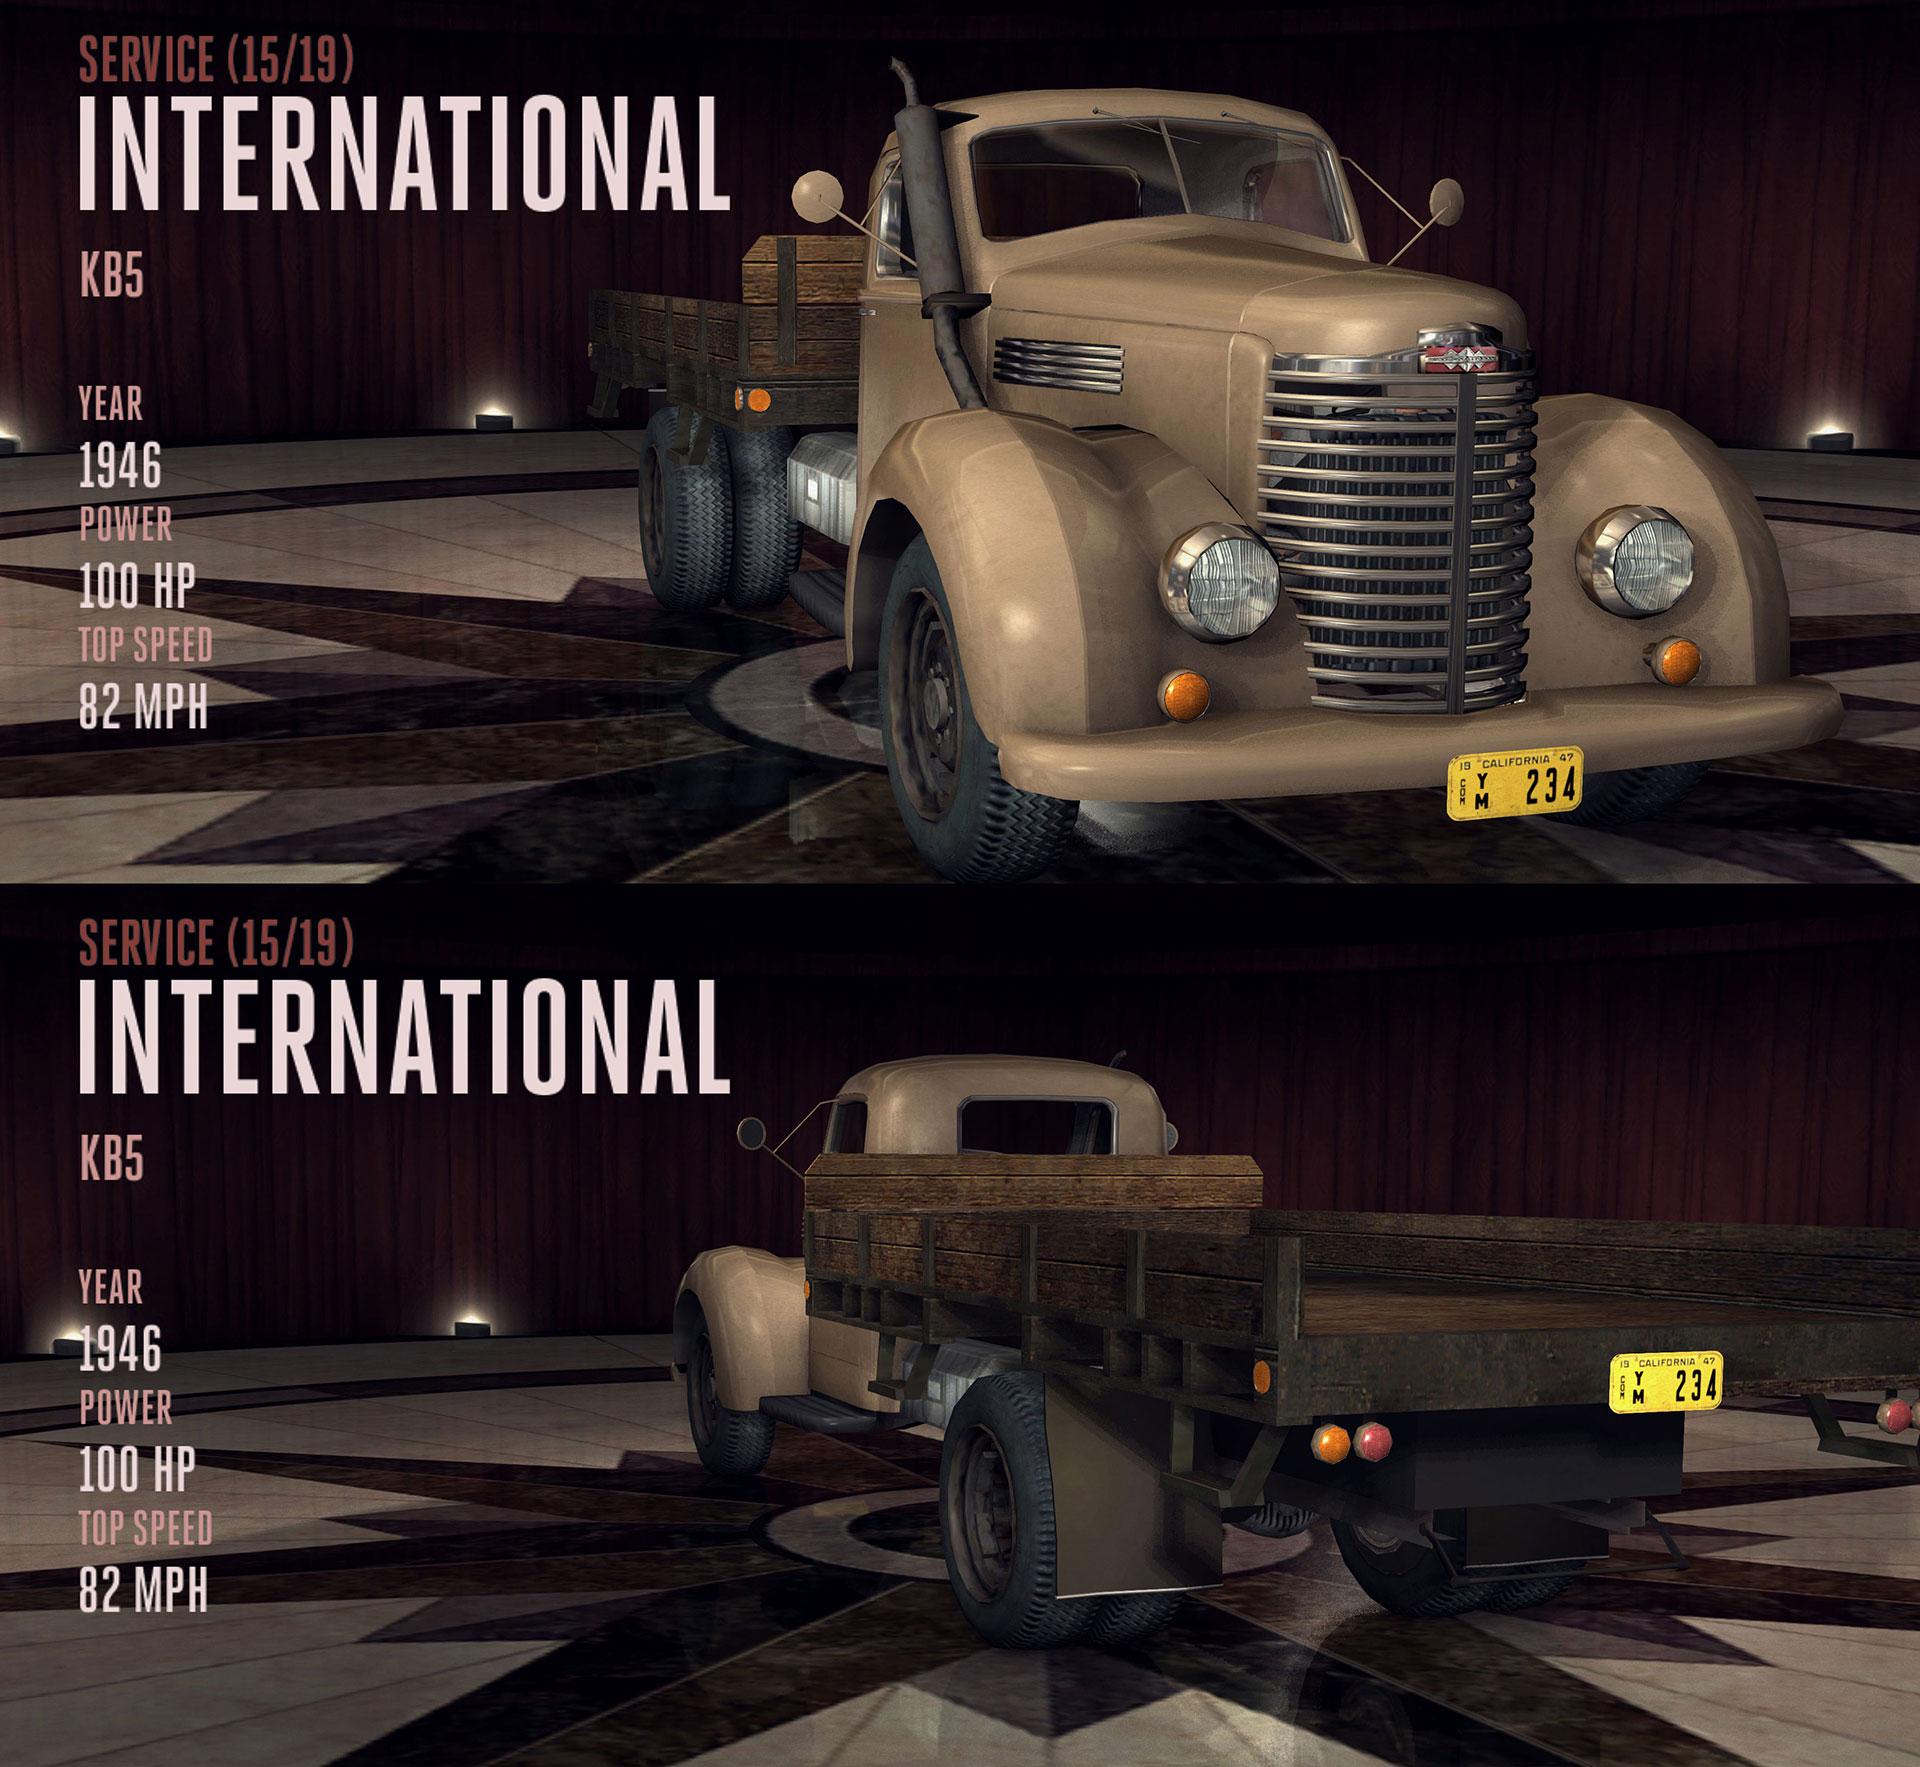 International KB5